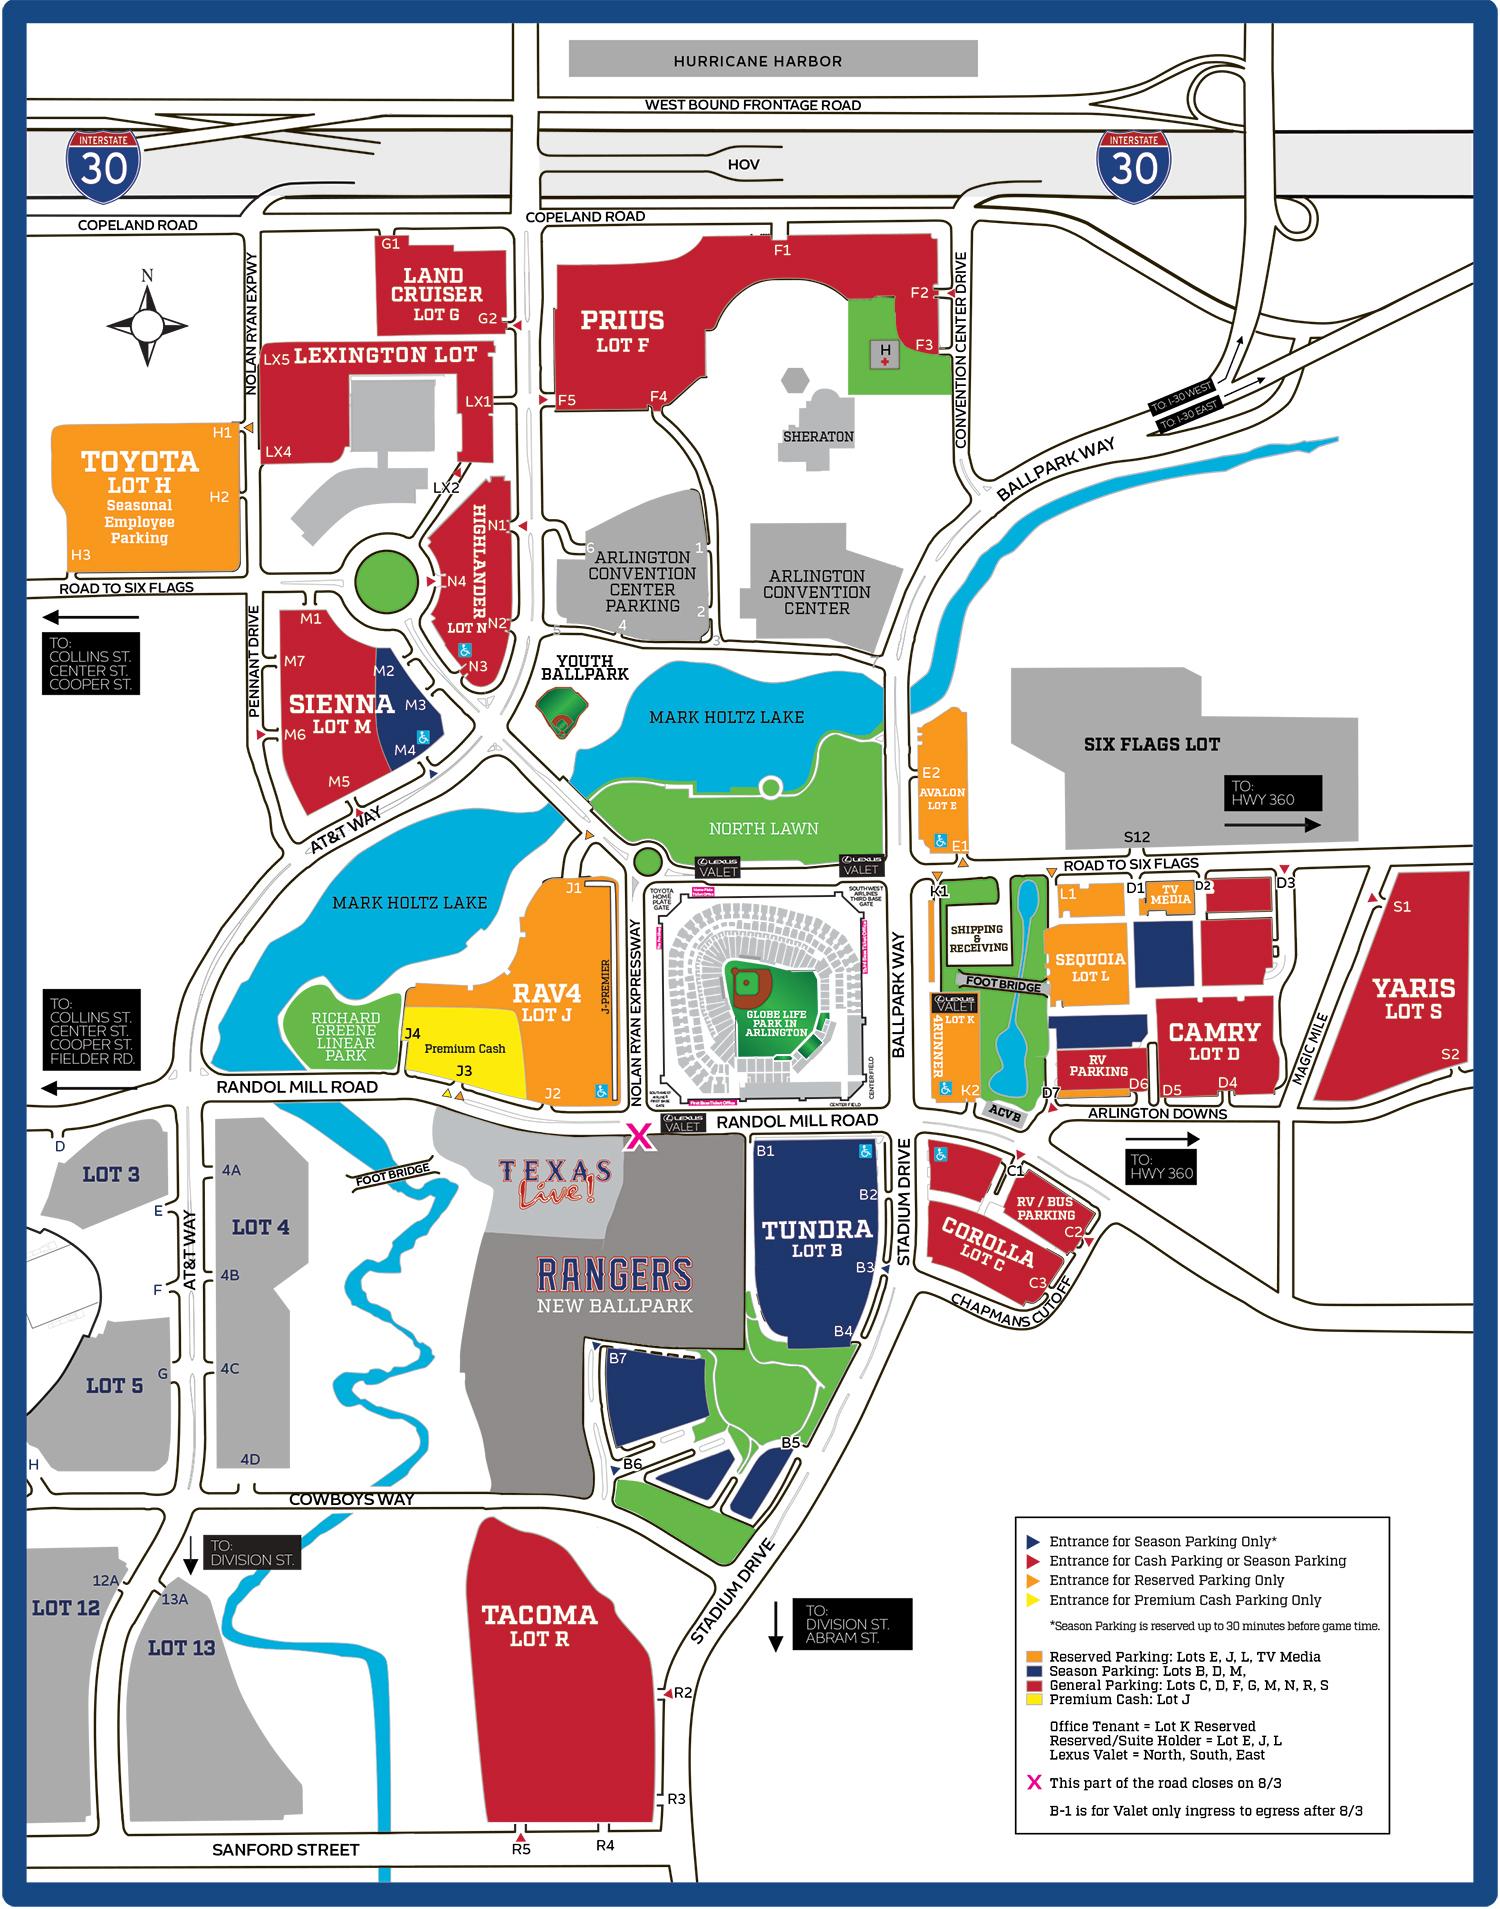 Rangers Advise Public Of Parking Lot Changes – Cbs Dallas / Fort Worth - Texas Rangers Season Ticket Parking Map